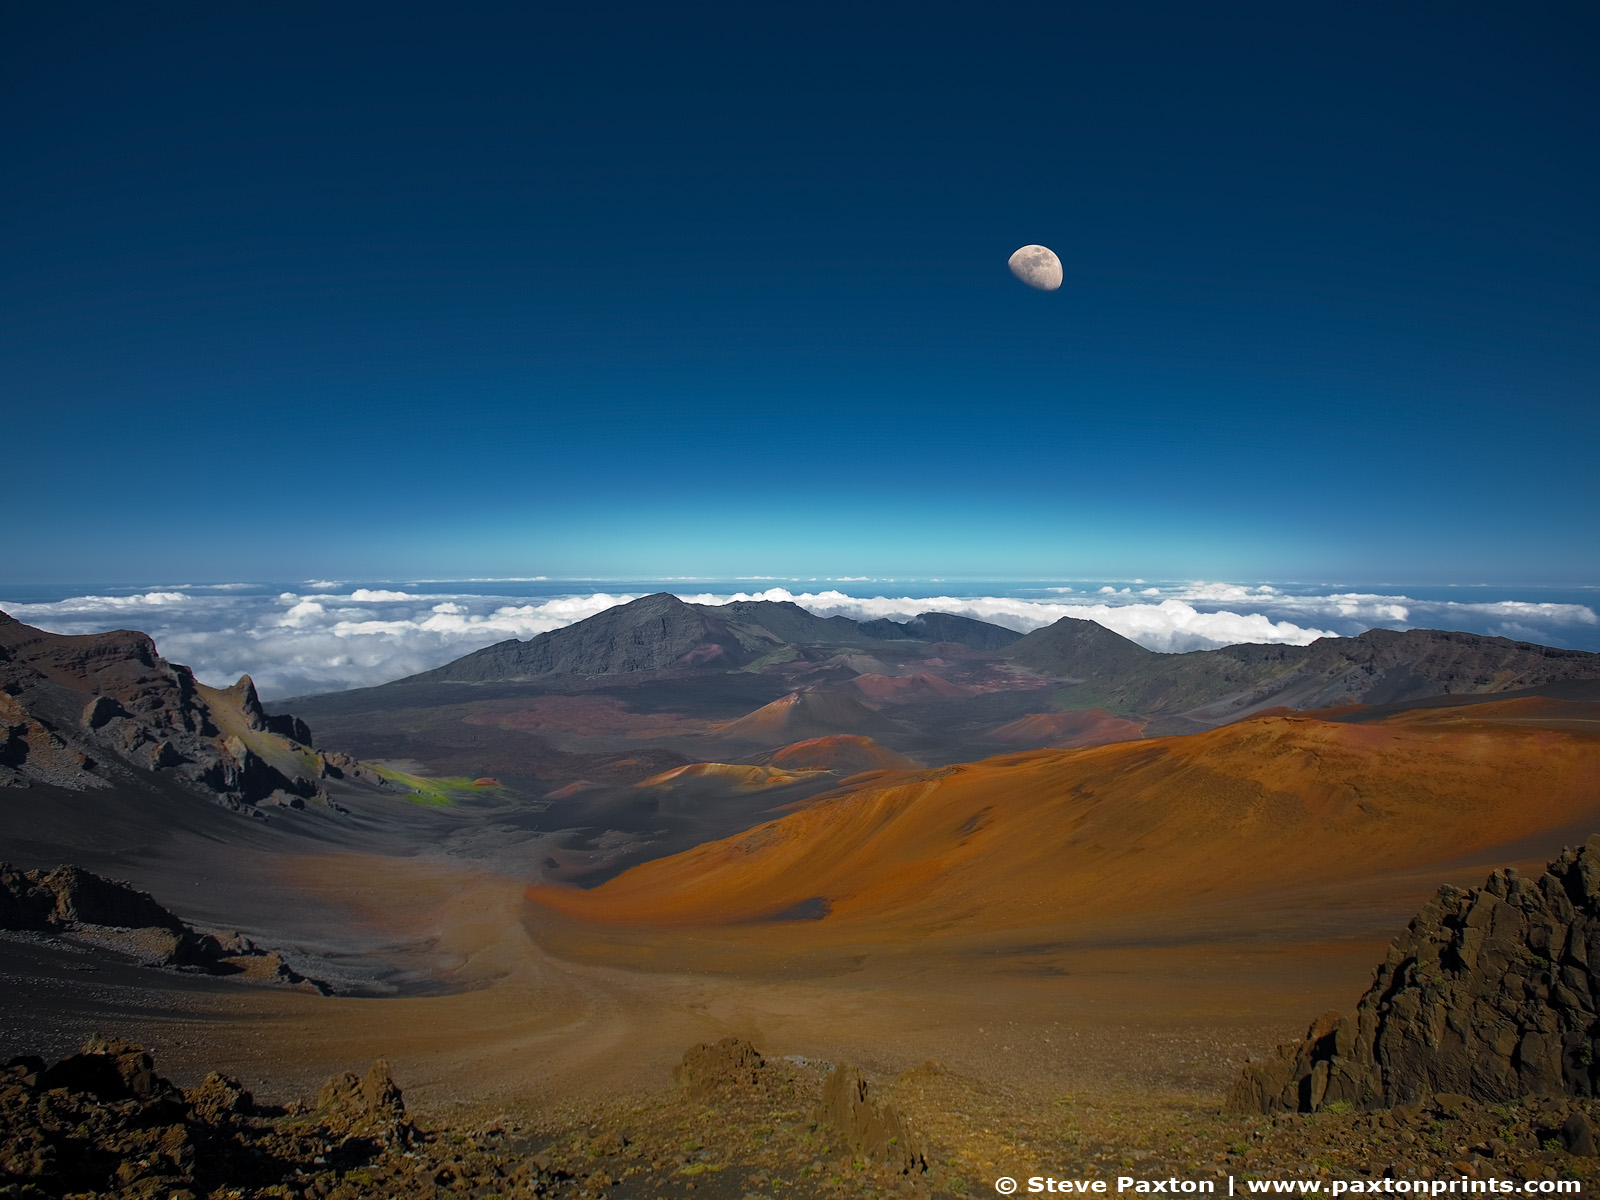 Fond d'ecran Lune et volcans - Wallpaper